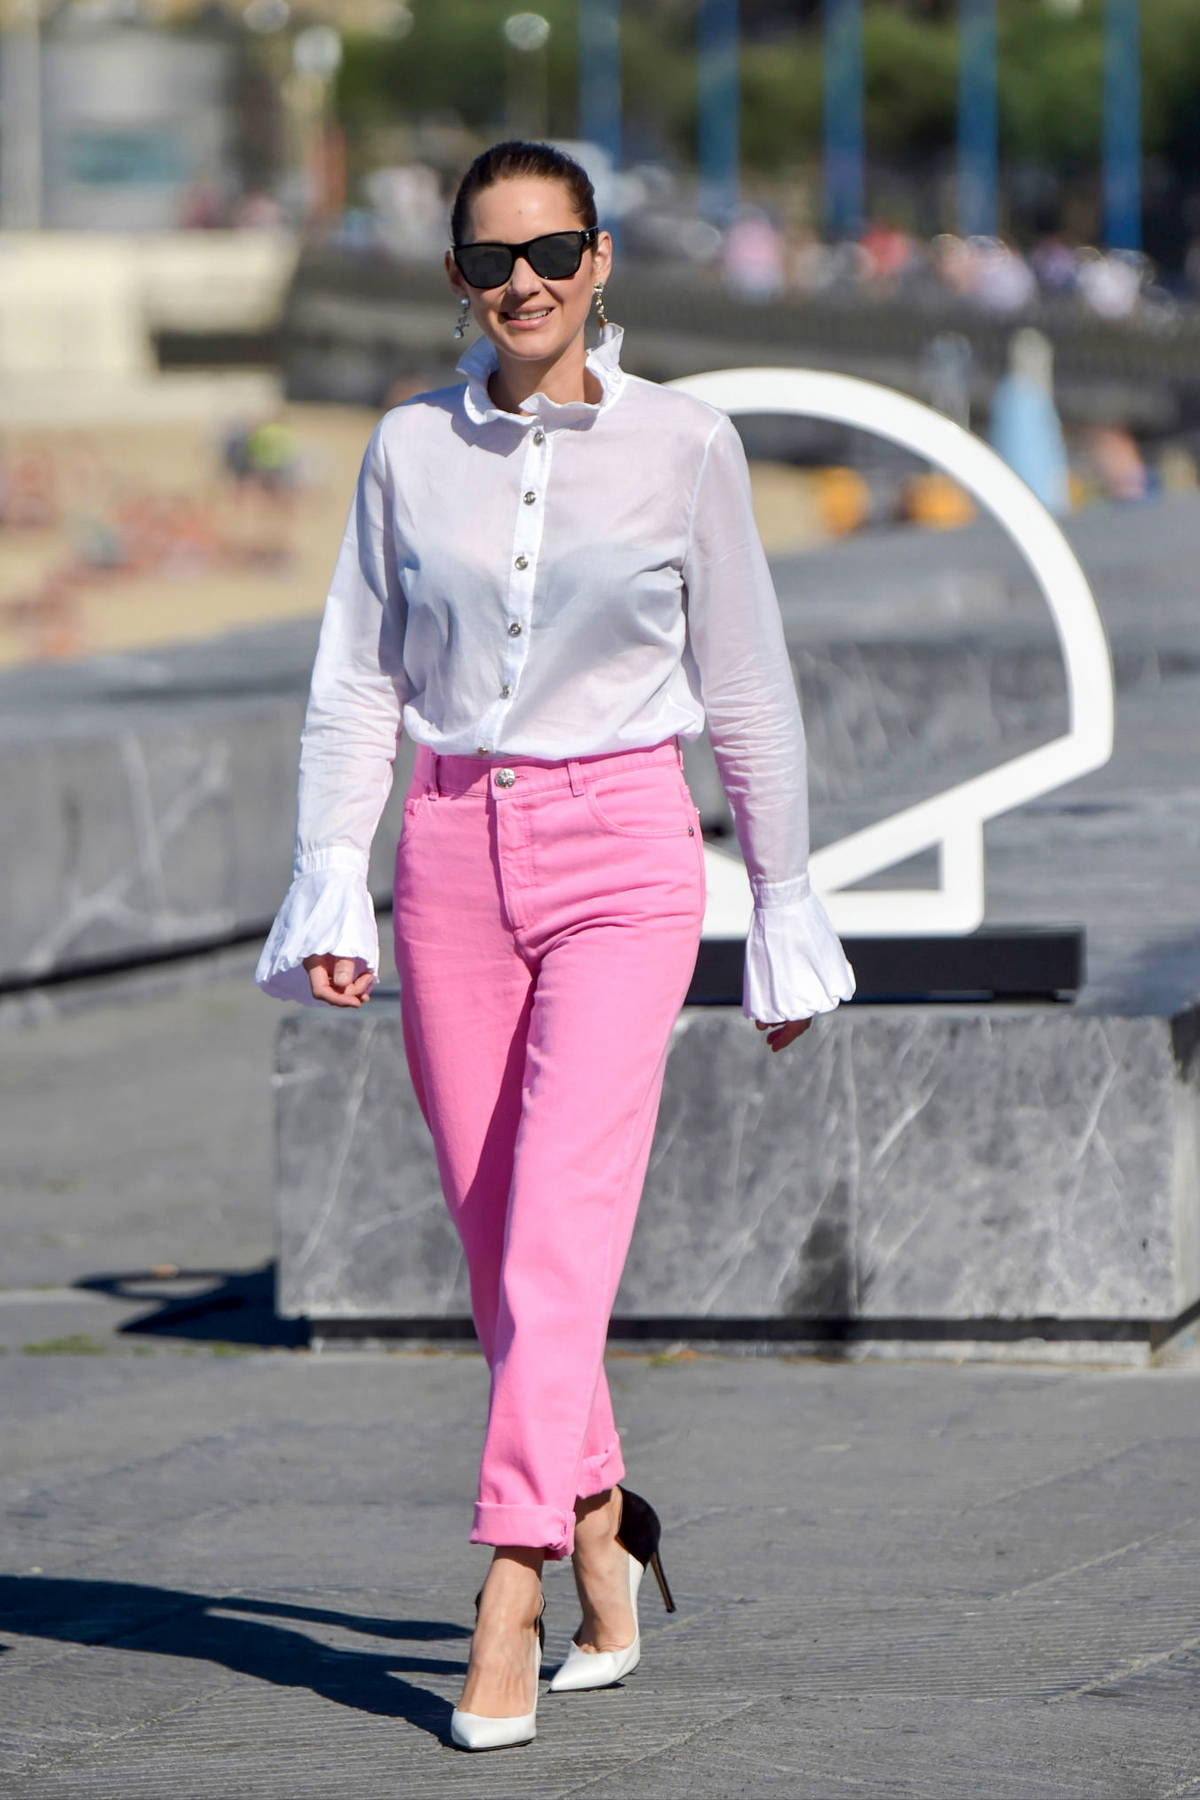 Marion Cotillard attends the Donostia Award photocall during the 69th San Sebastian International Film Festival in San Sebastian, Spain